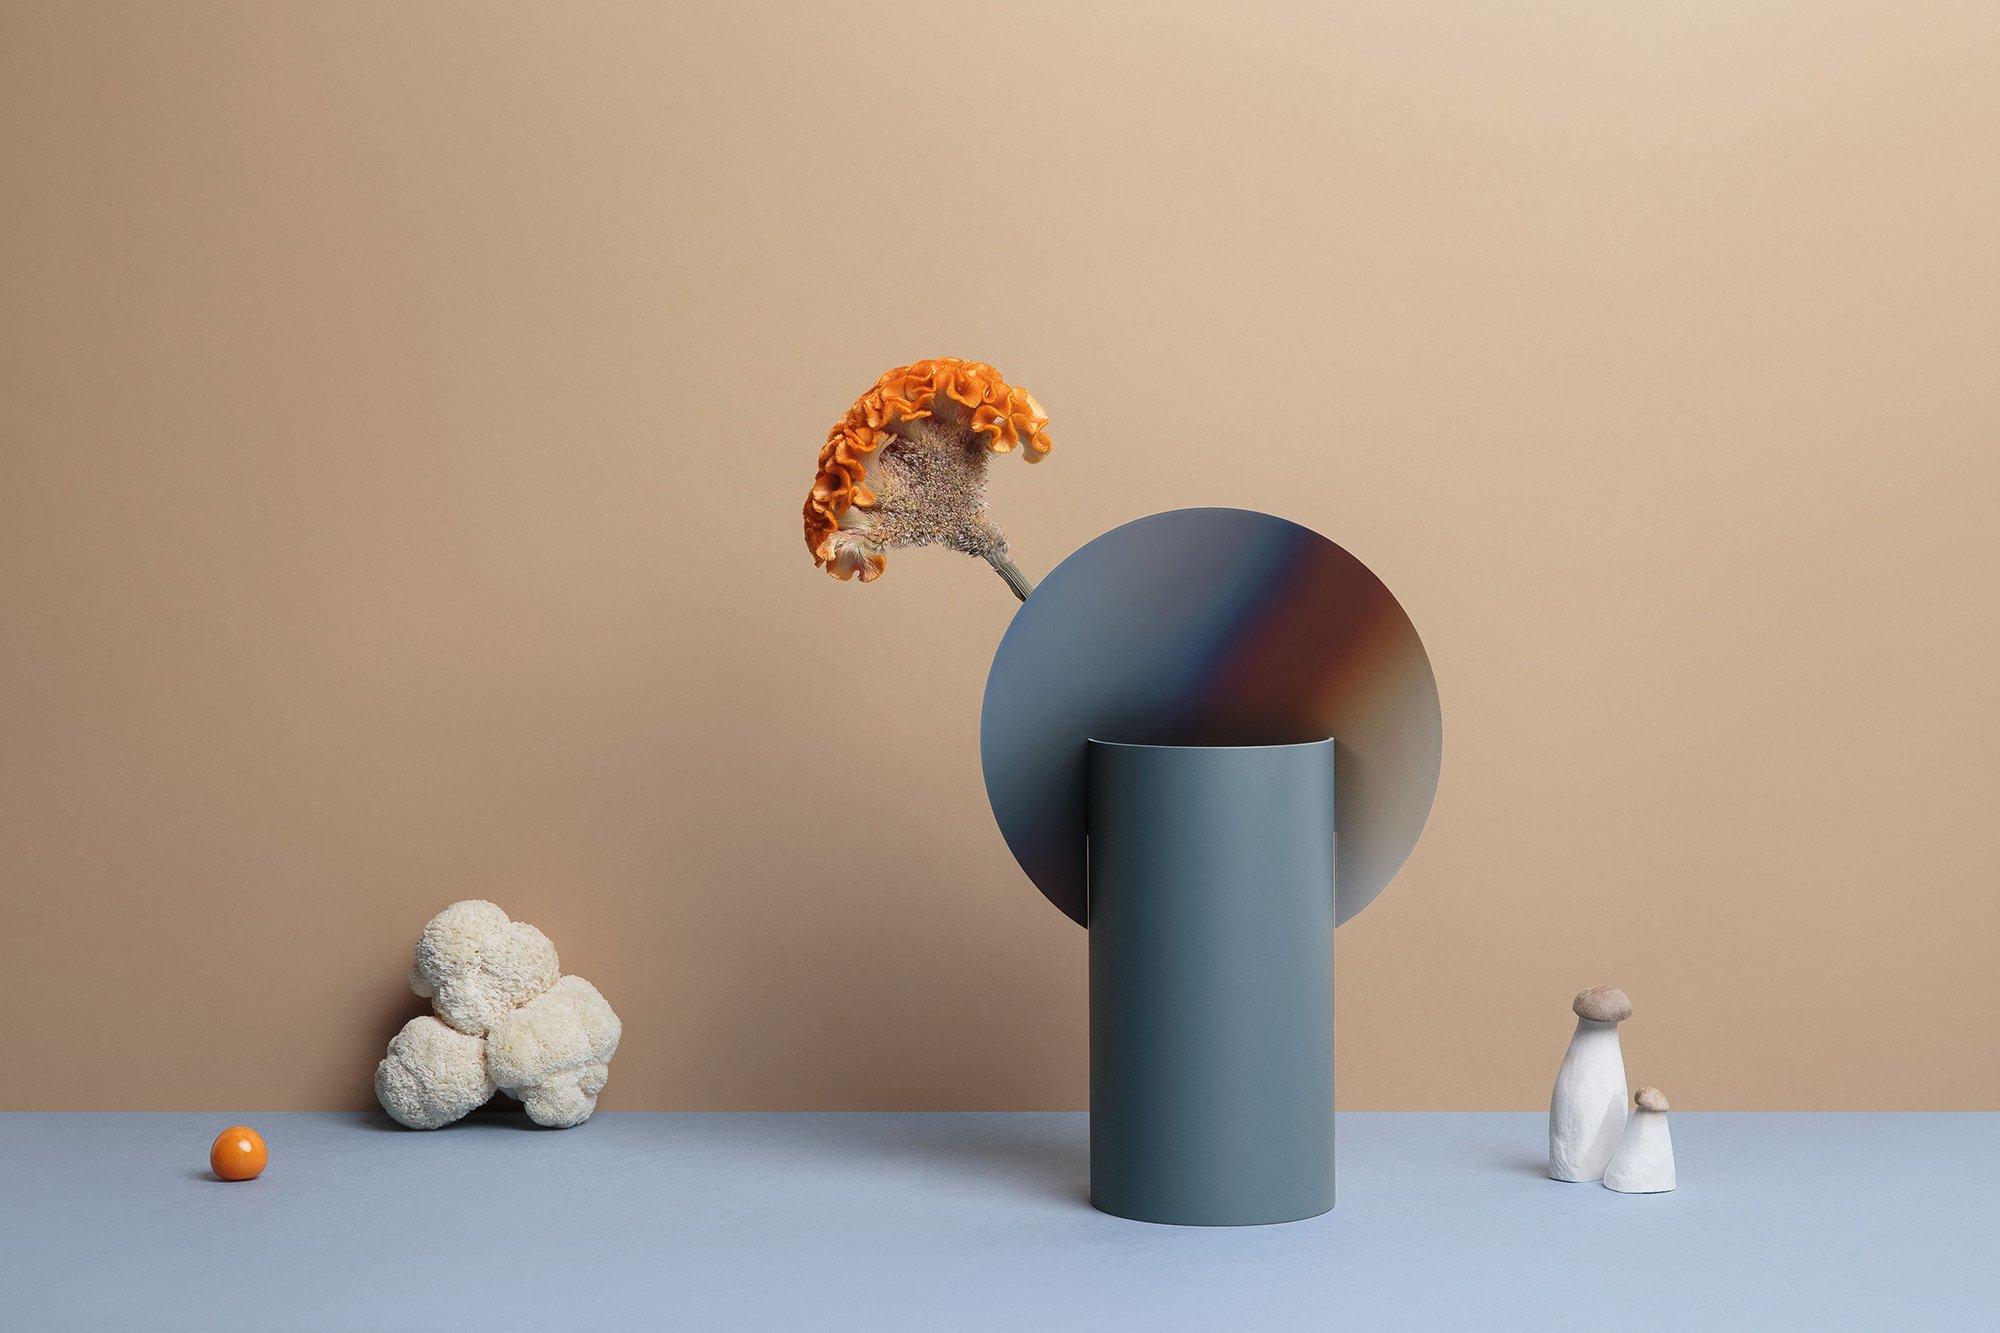 Maison et Objet 2020, NOOM, new Malevich Limited Edition vase